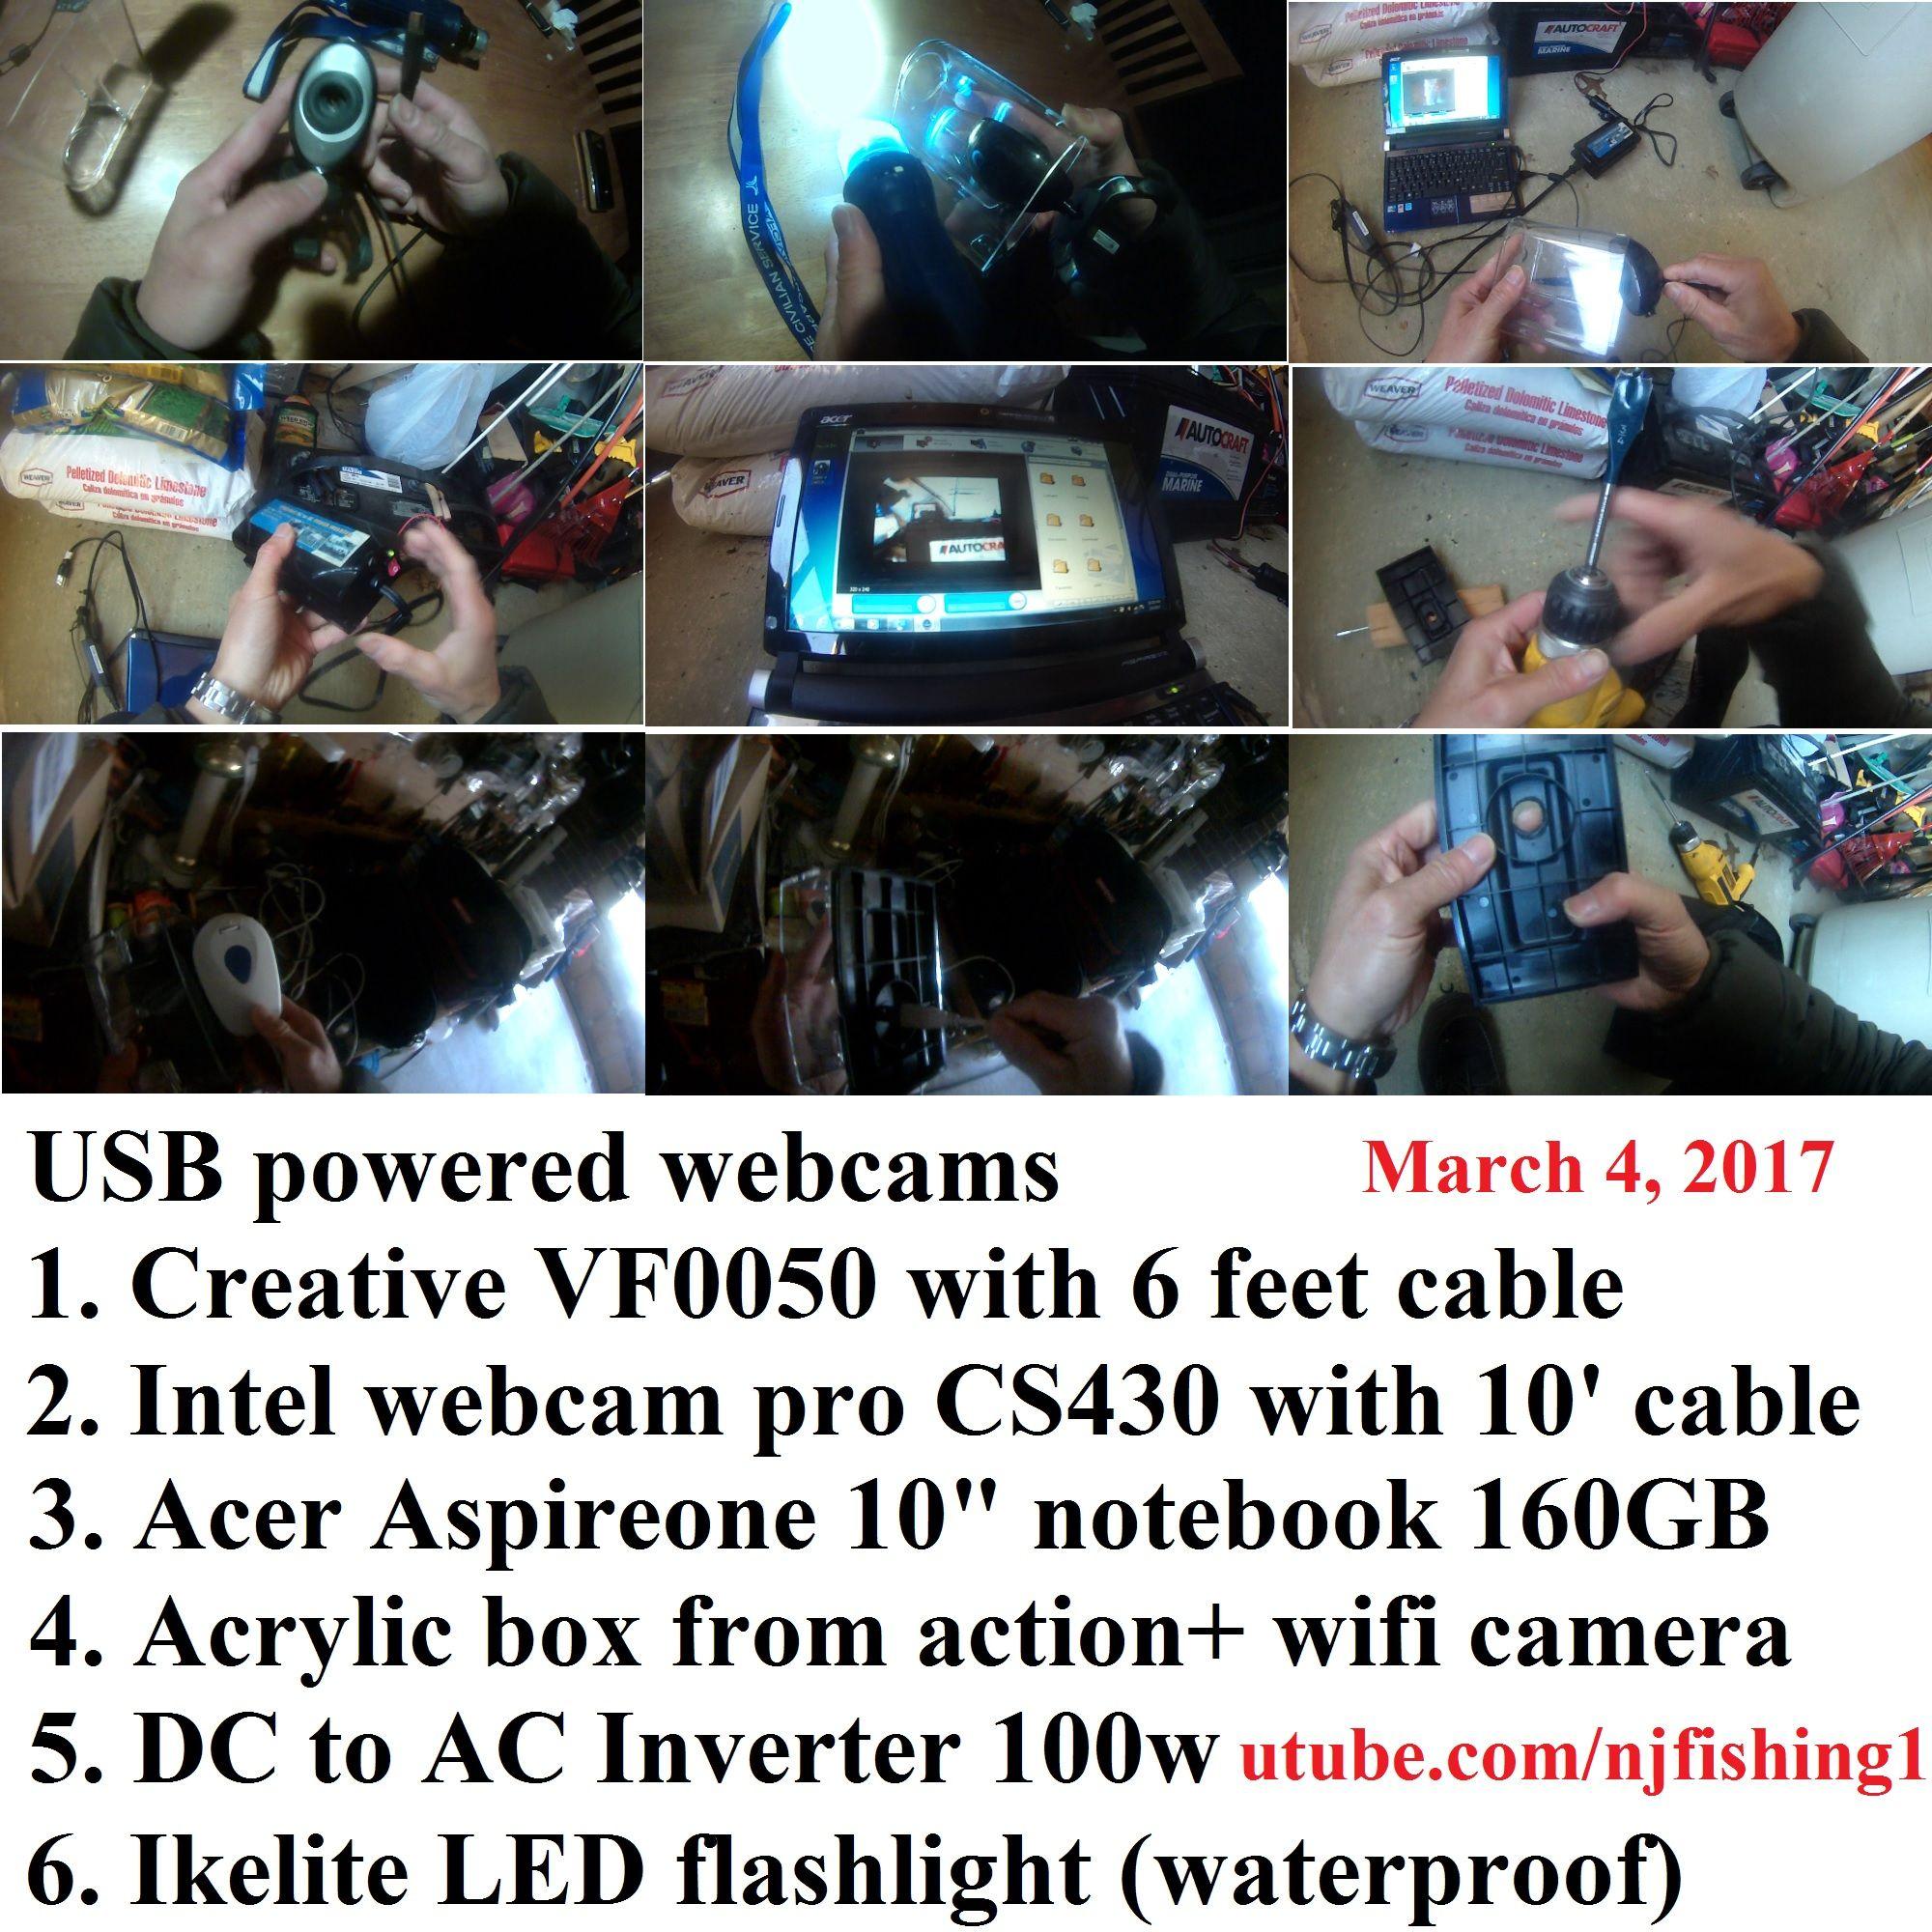 My free live web cam